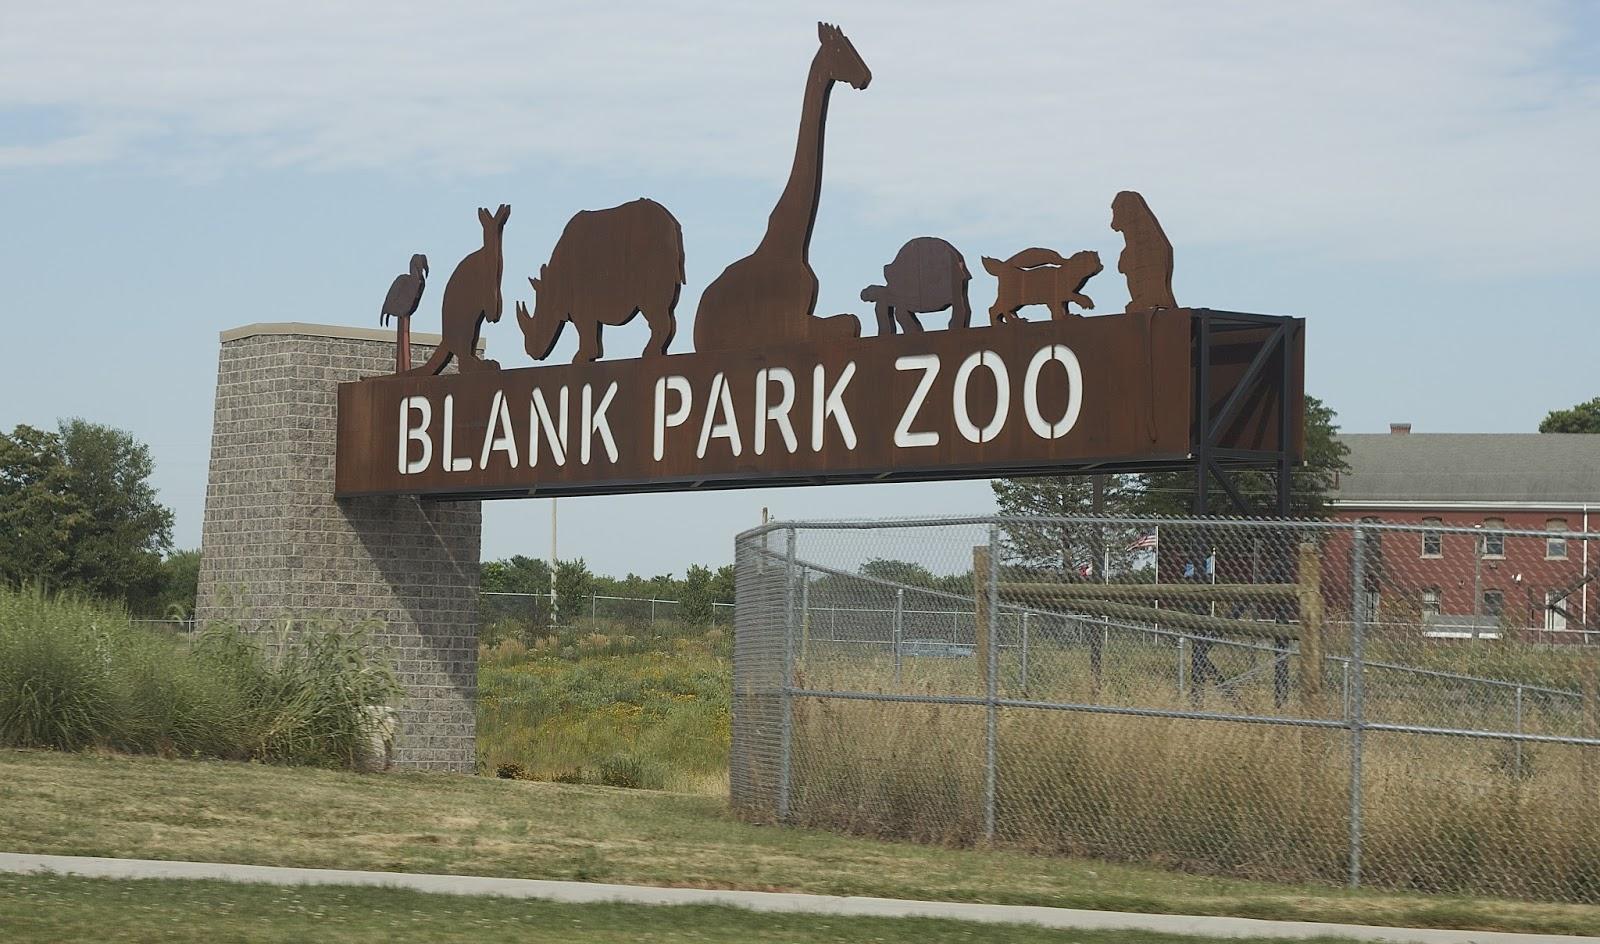 Blank Park Zoo | White Gold